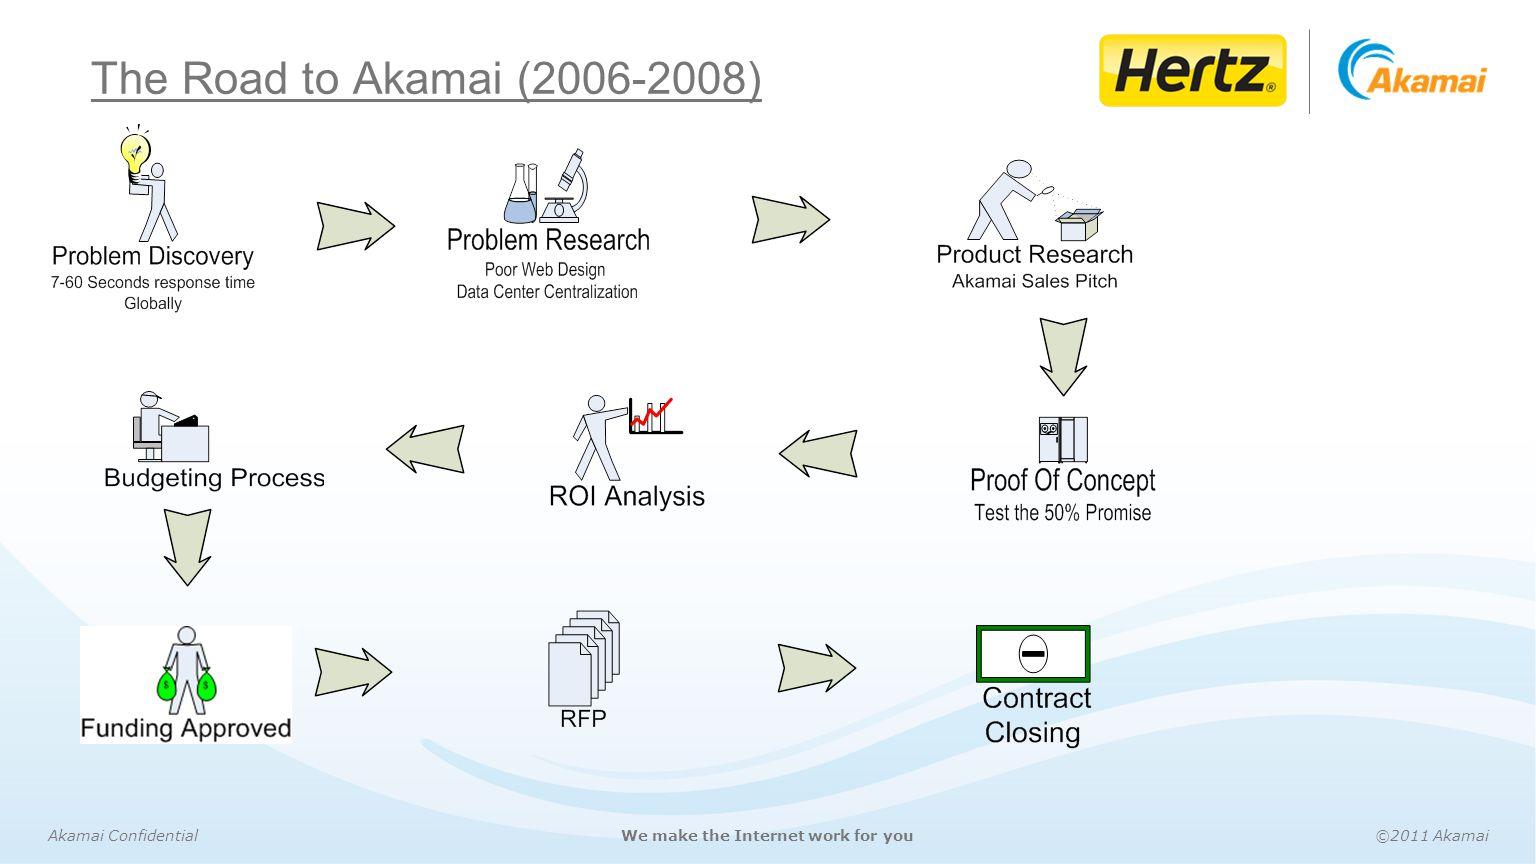 Akamai Confidential©2011 AkamaiWe make the Internet work for you Your logo The Road to Akamai (2006-2008)